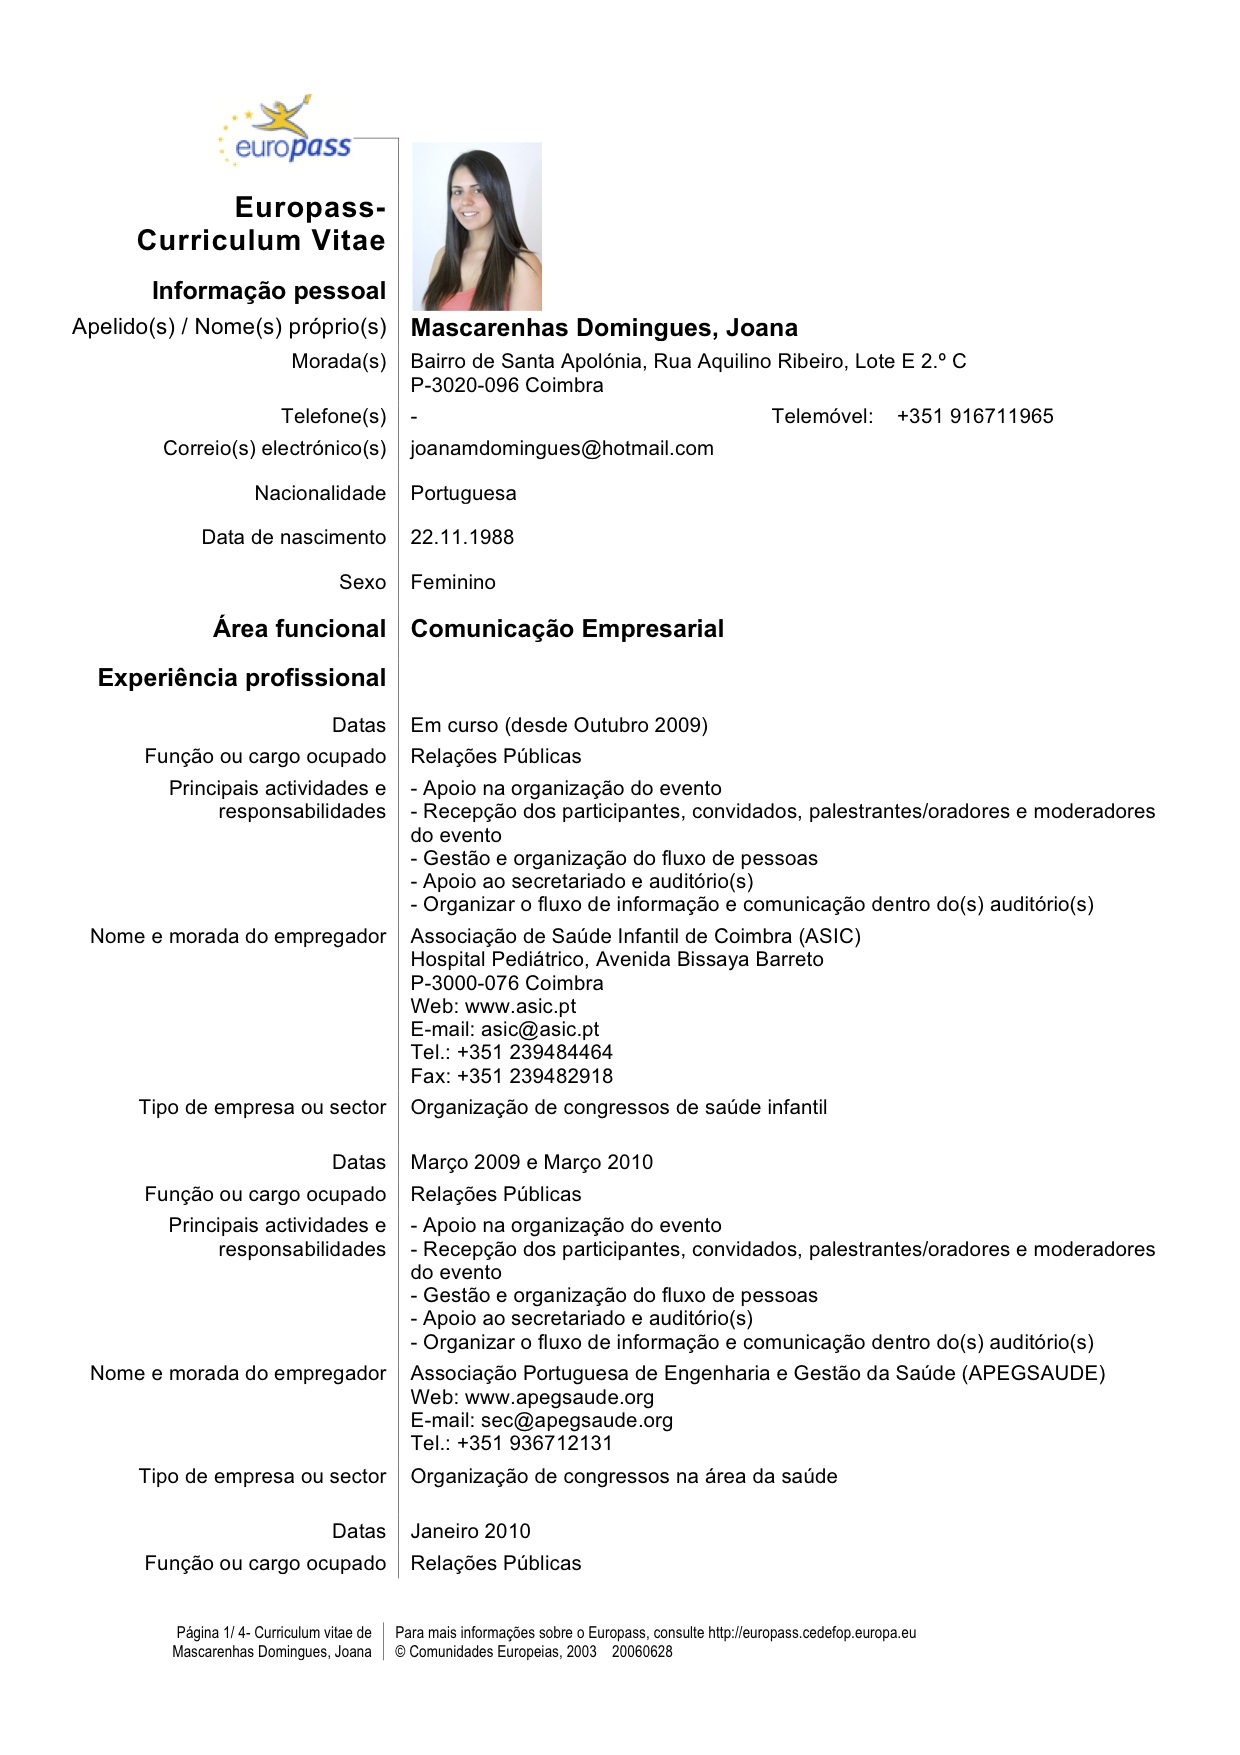 curriculum vitae generator sample customer service resume curriculum vitae generator online resume generator cv builder at joanamdomingueswordpresscurriculum vitaecv europass